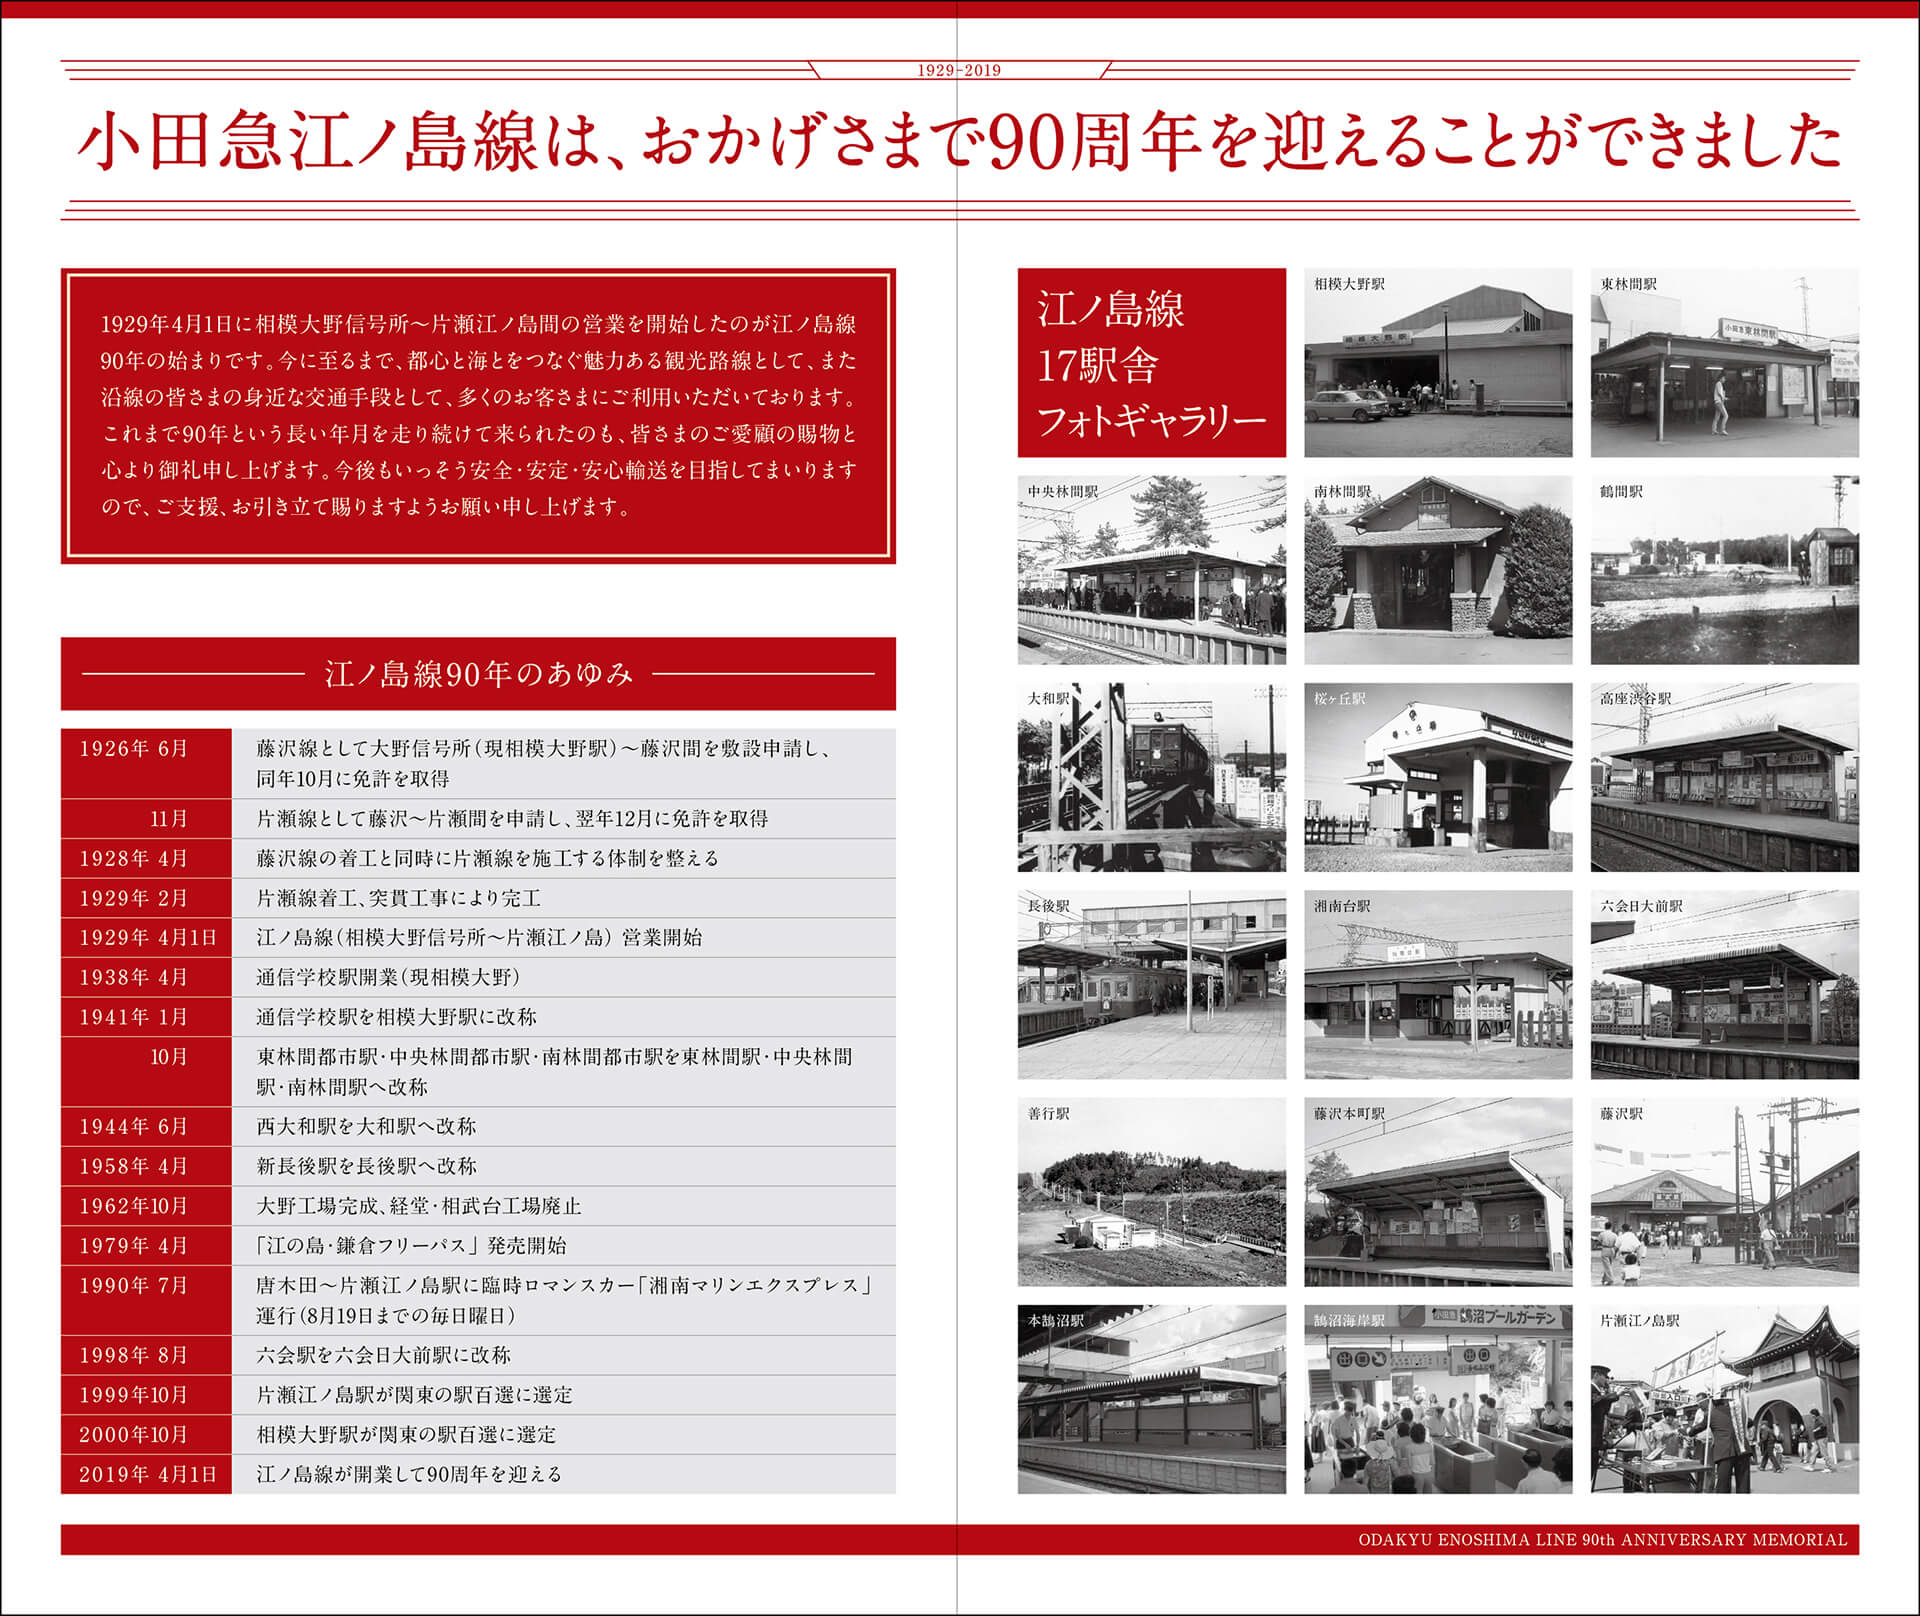 小田急江ノ島線 開業90周年記念イベント/記念乗車券台紙